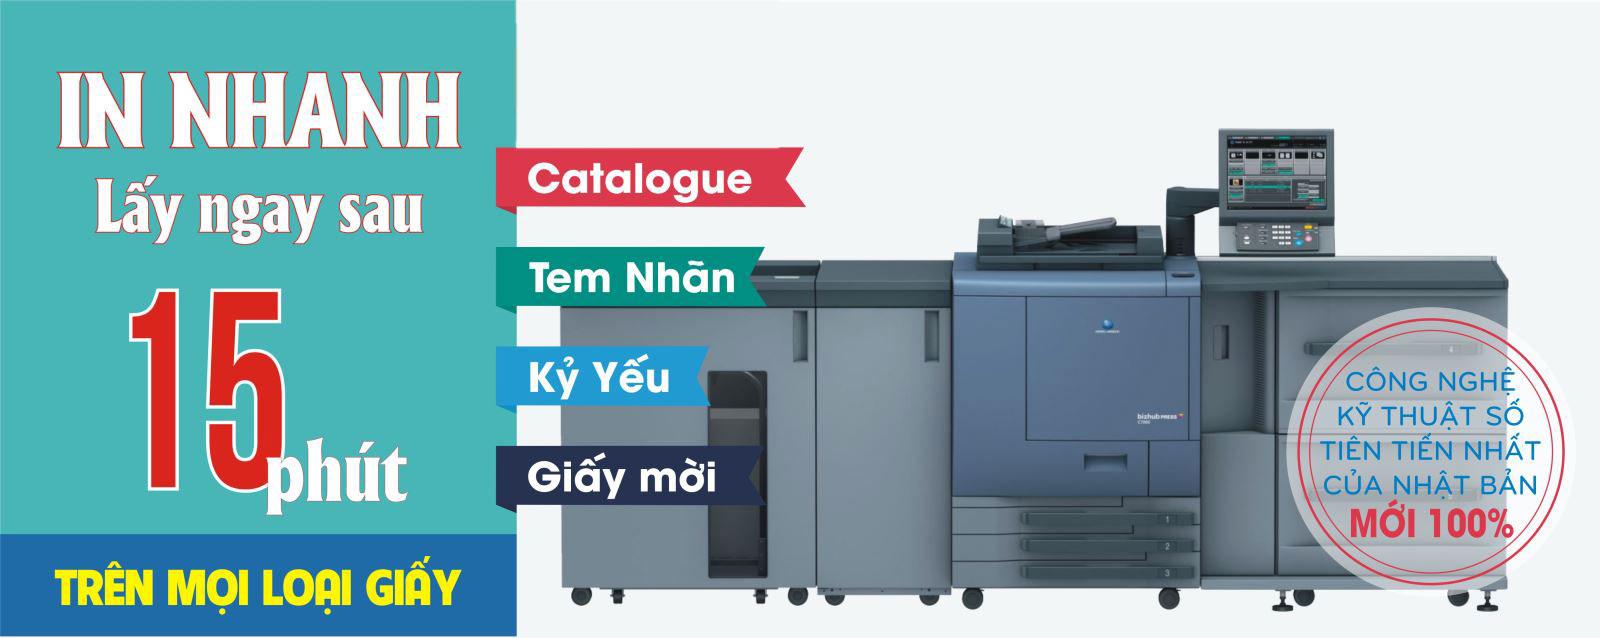 CTY IN ĐỨC AN  | Công ty in ấn, in sổ tay, sản xuất sổ da